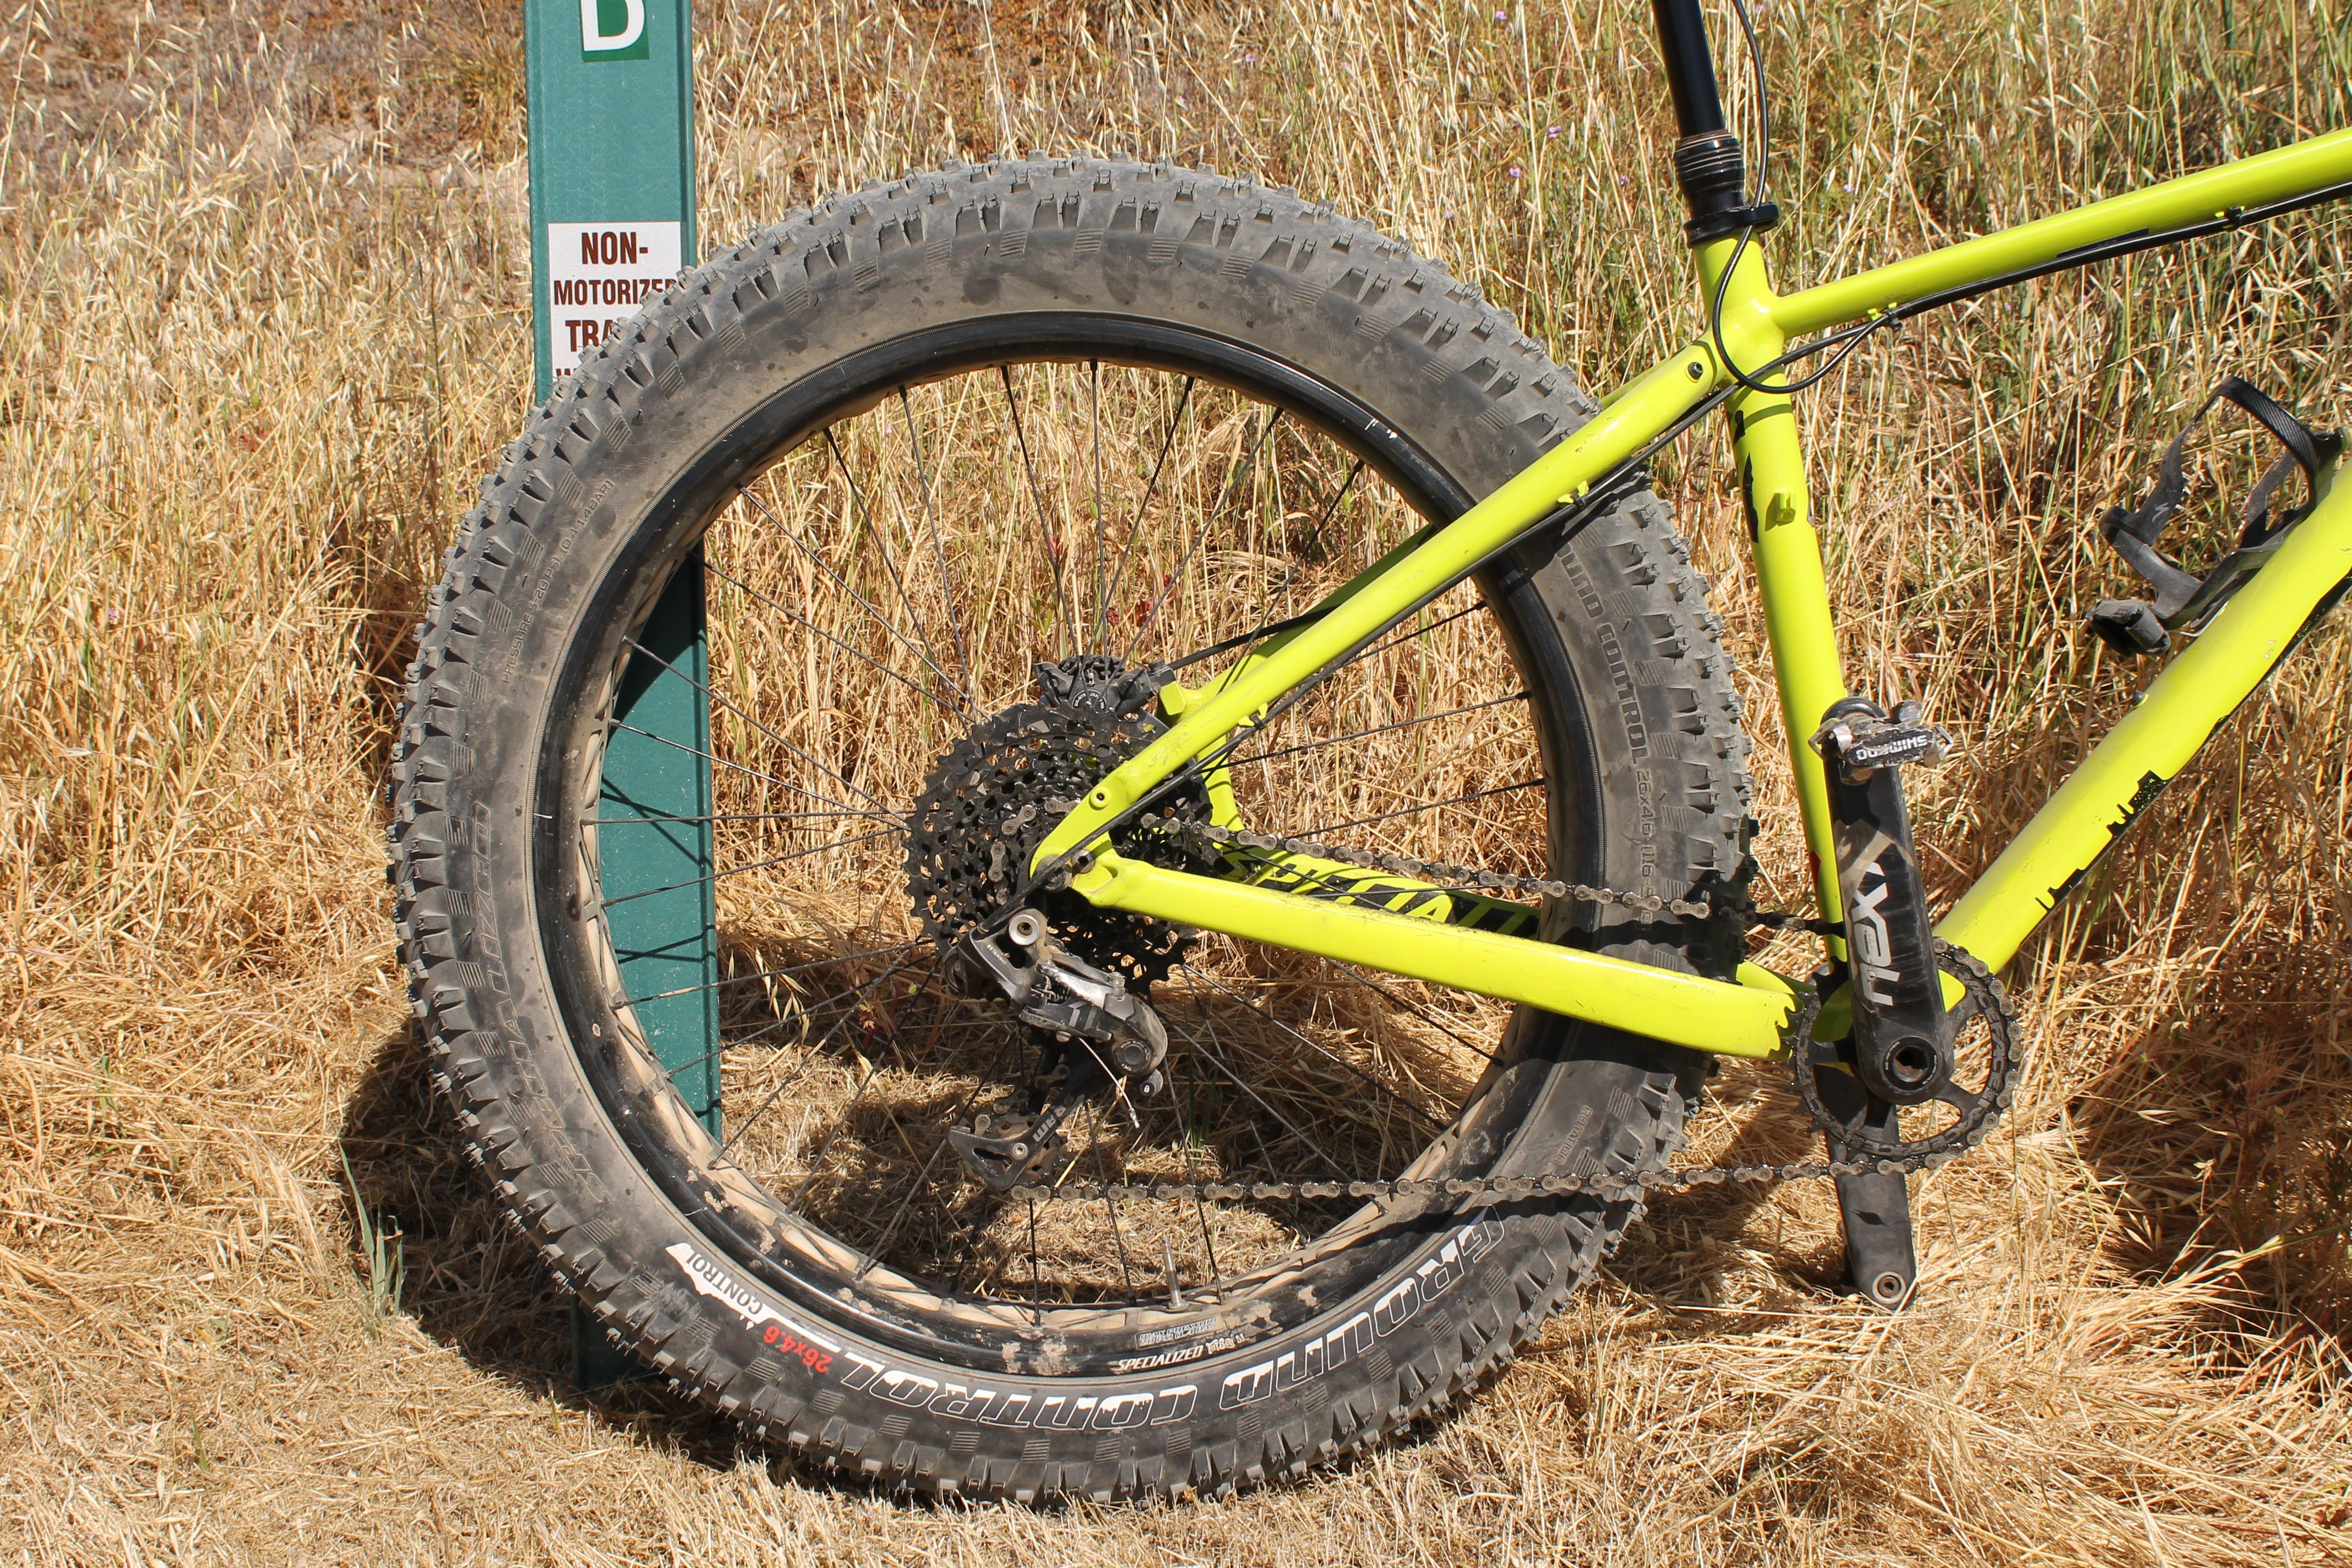 test ride review specialized fatboy pro fat bike. Black Bedroom Furniture Sets. Home Design Ideas